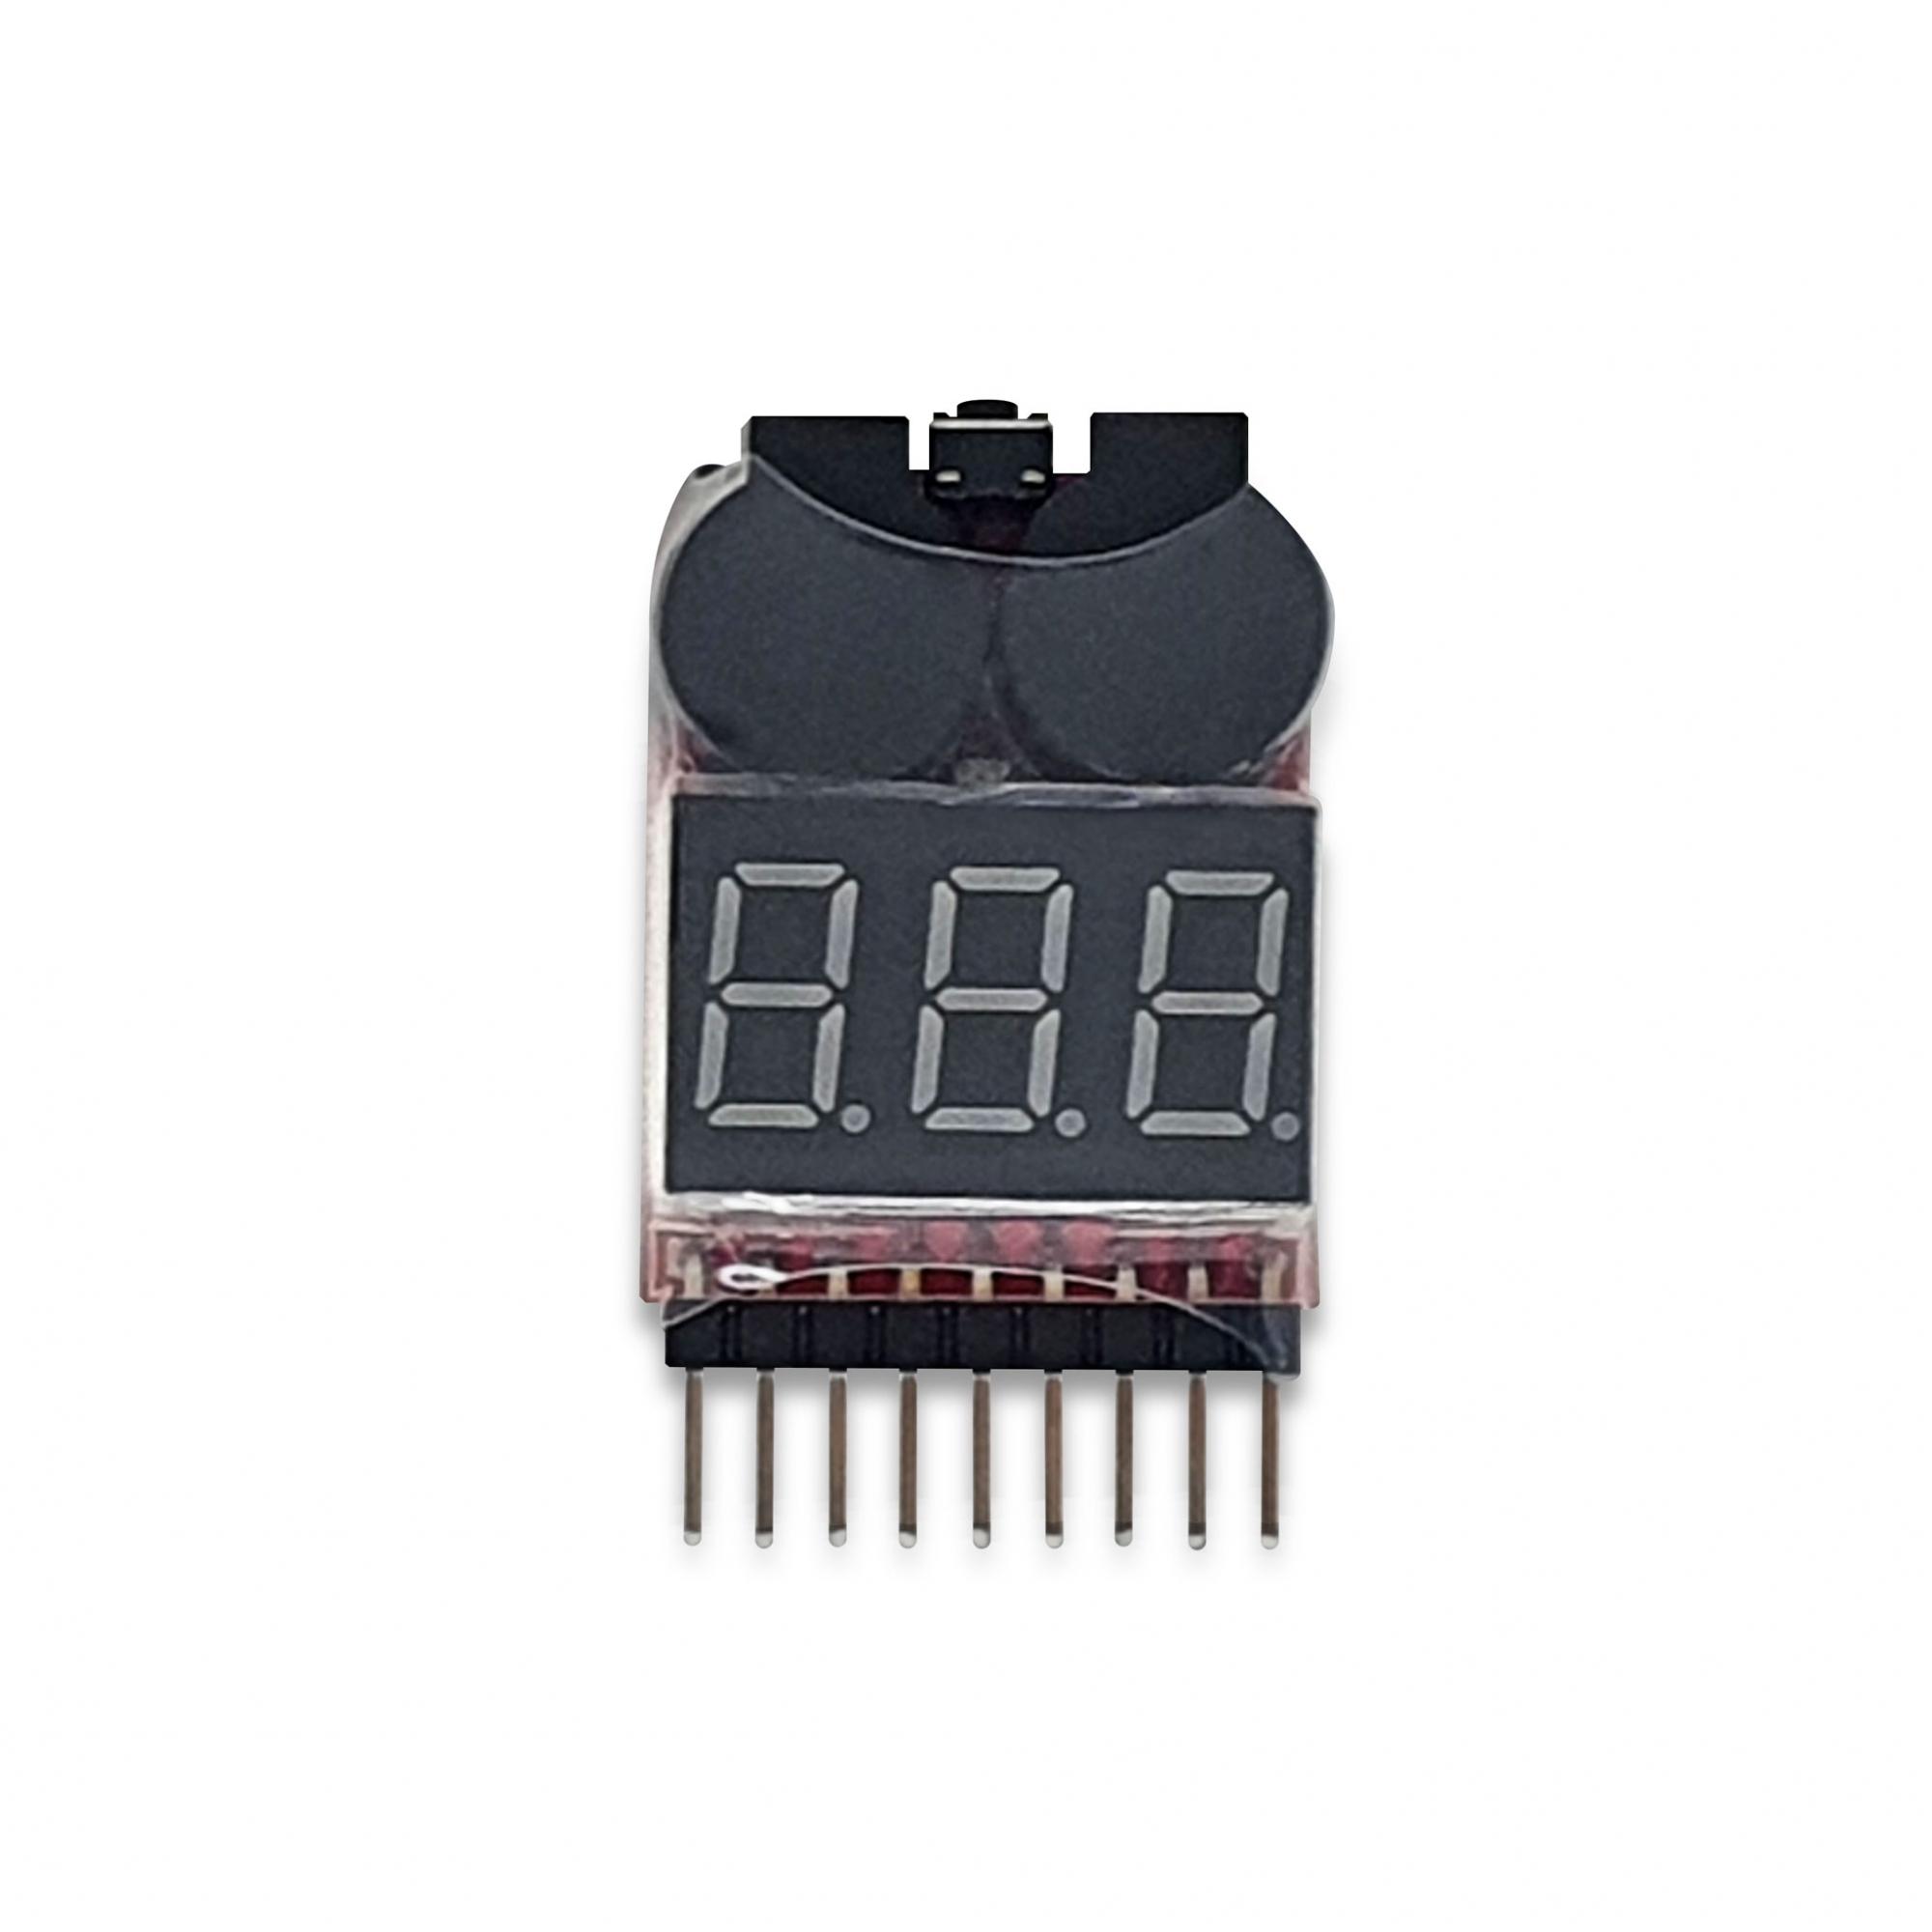 Teste Bateria Li-po 1-8 S